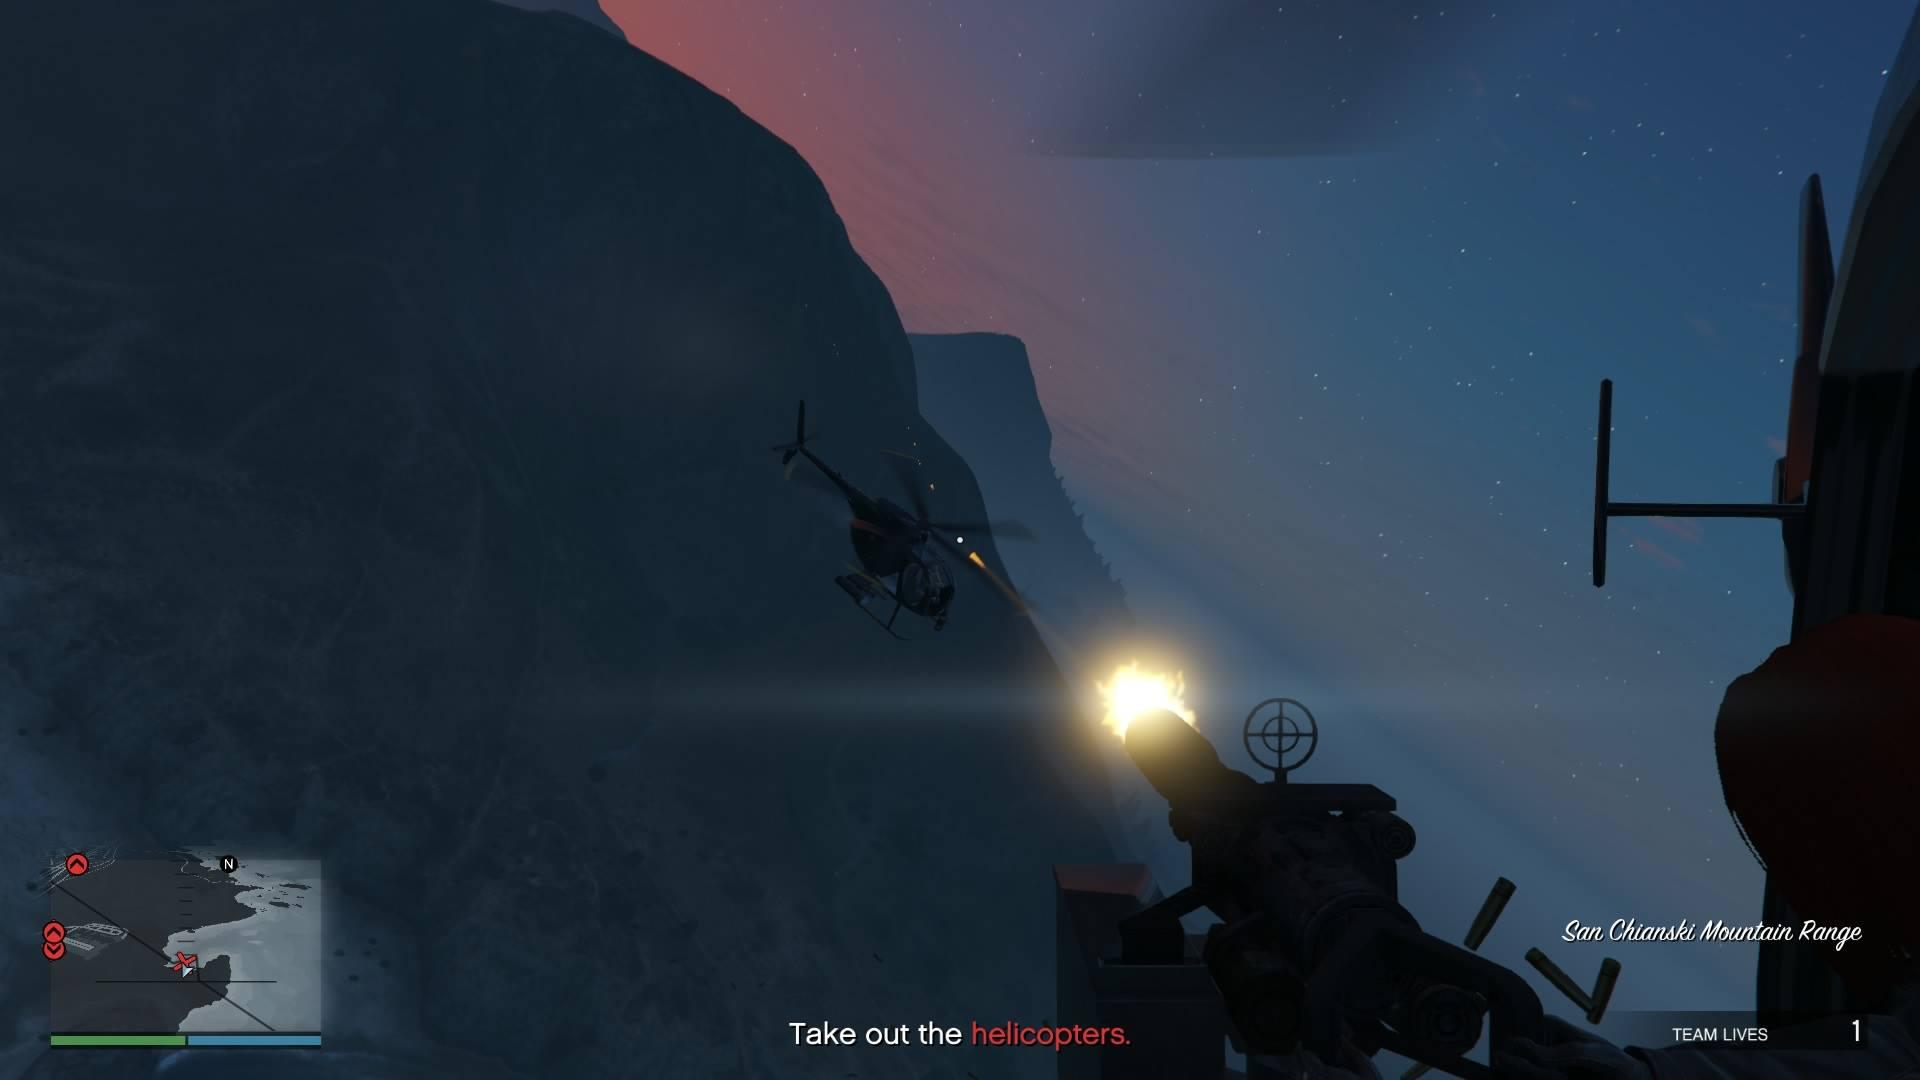 killchoppers